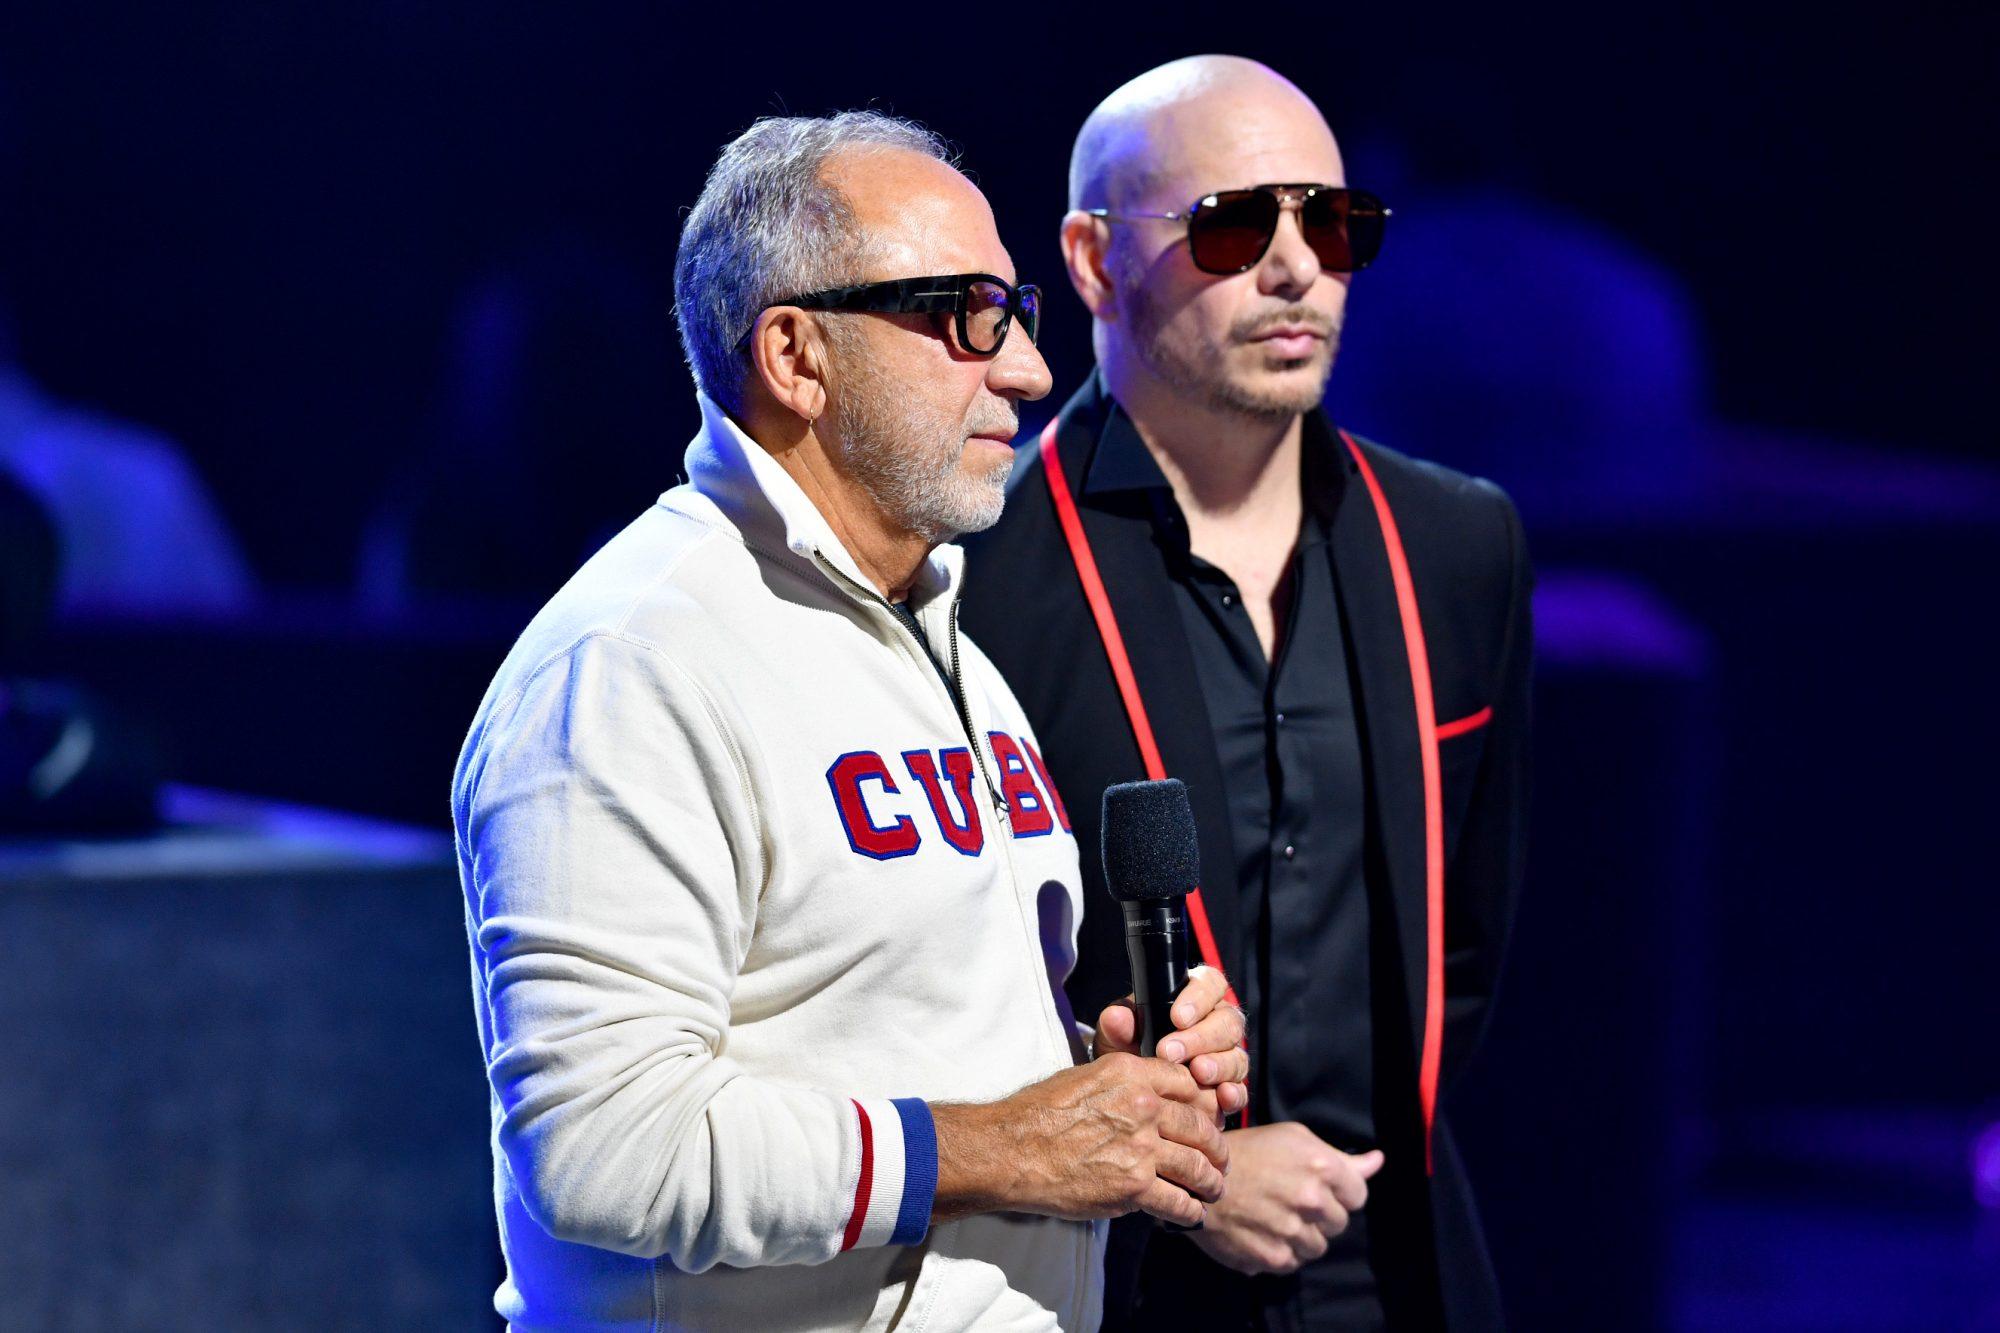 Emilio Estefan and Pitbull speak onstage at Premios Juventud 2021 at Watsco Center pidem ayuda a Cuba